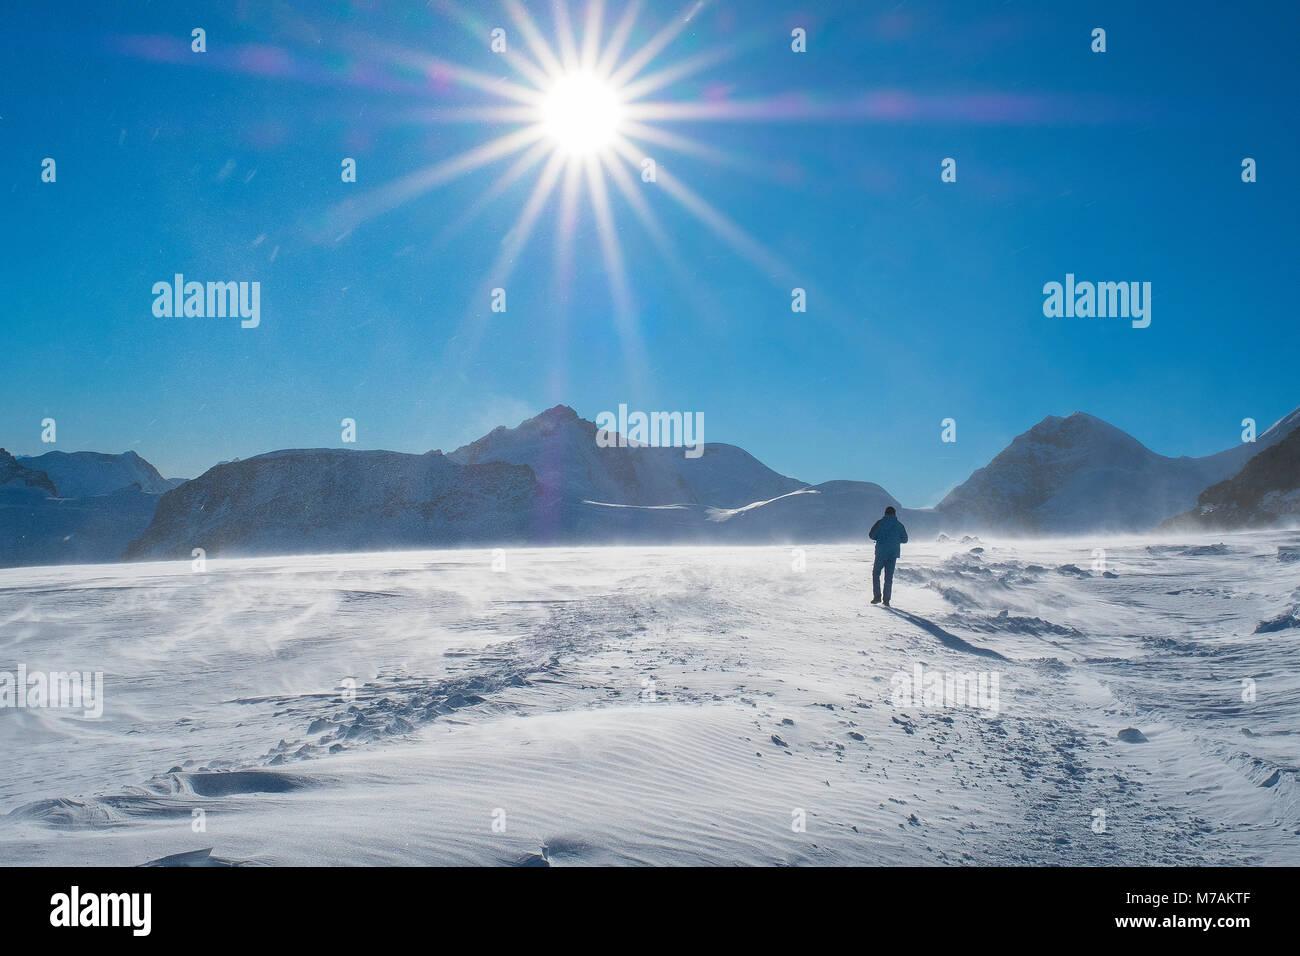 Winter hiker on the Jungfraujoch, Top of Europe, Jungfraujoch, Berner Oberland, canton of Bern, Switzerland - Stock Image